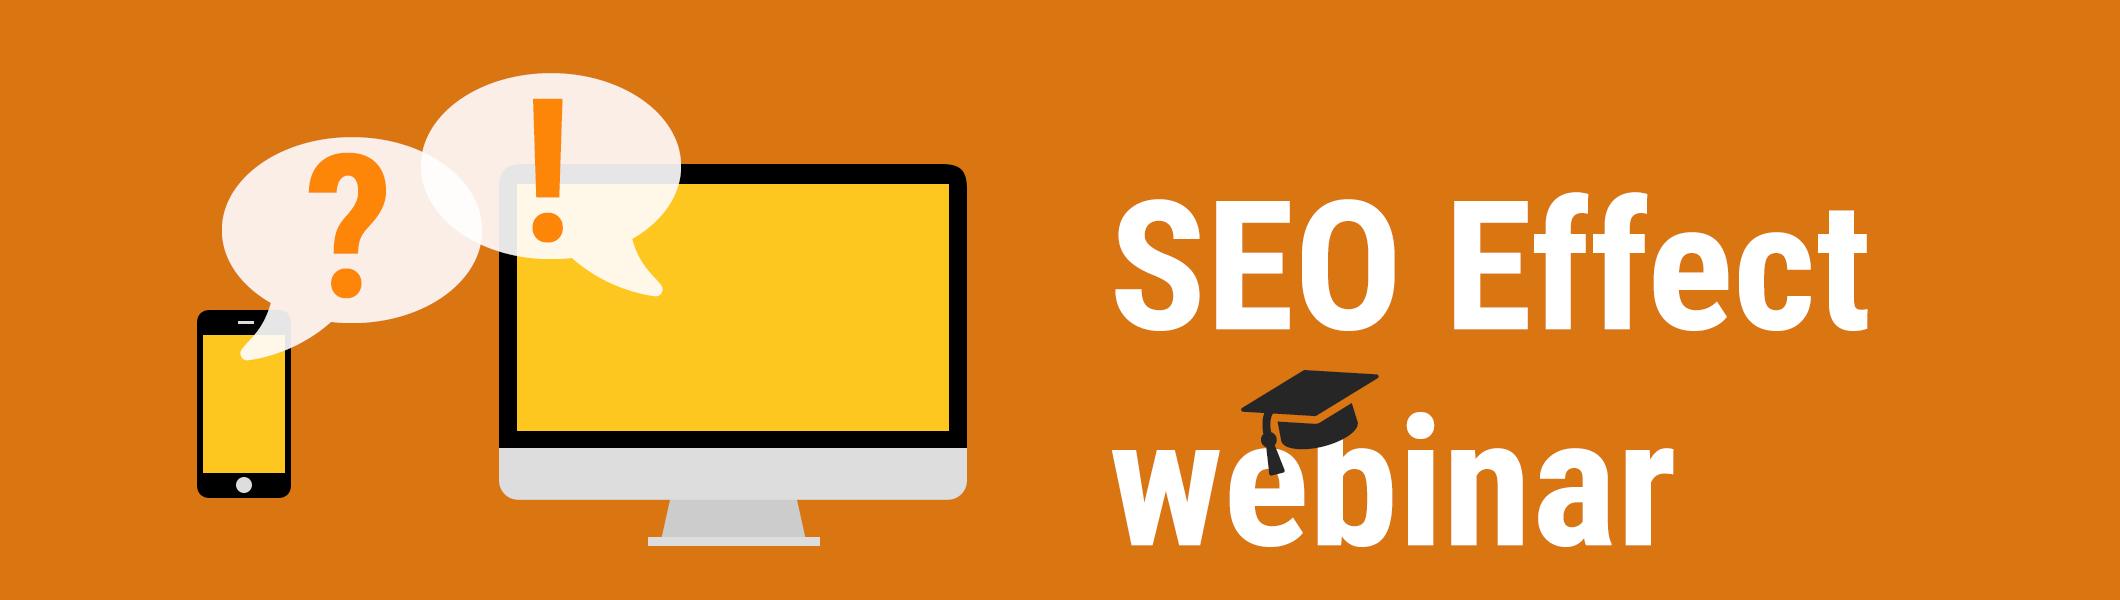 SEO webinar, gratis webinars van SEO Effect